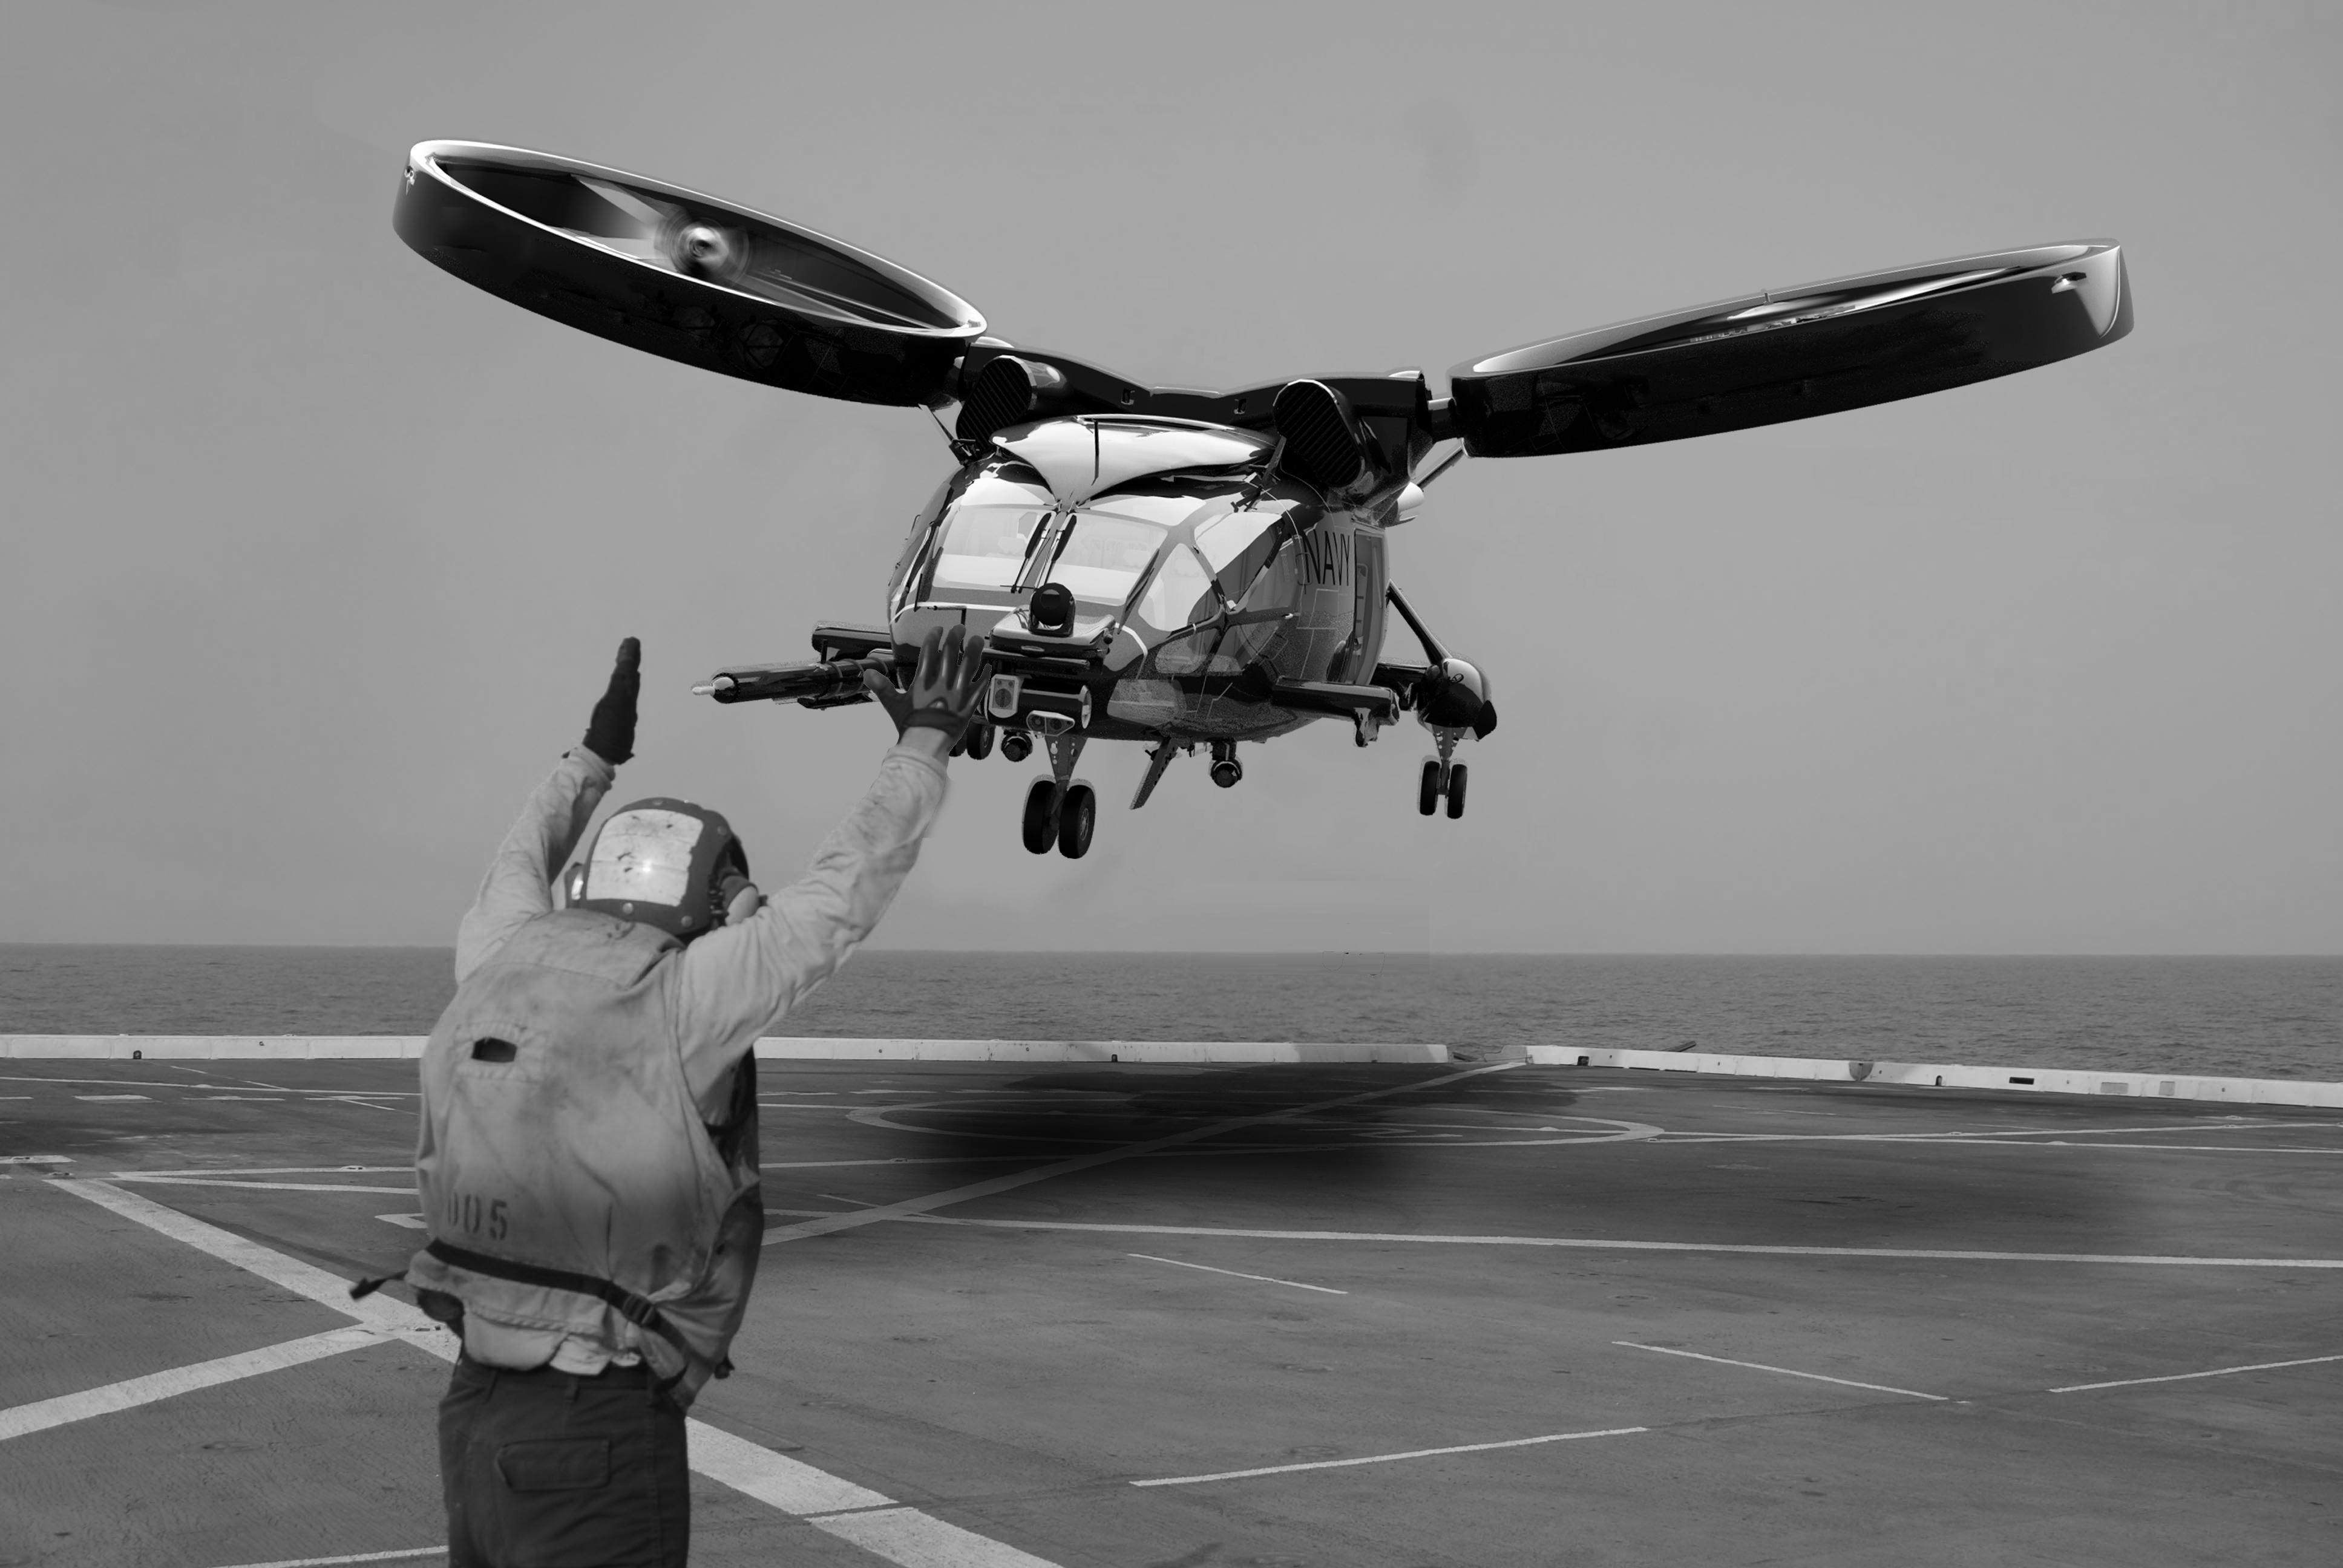 Landing at sea by Liam Keating Força aerea